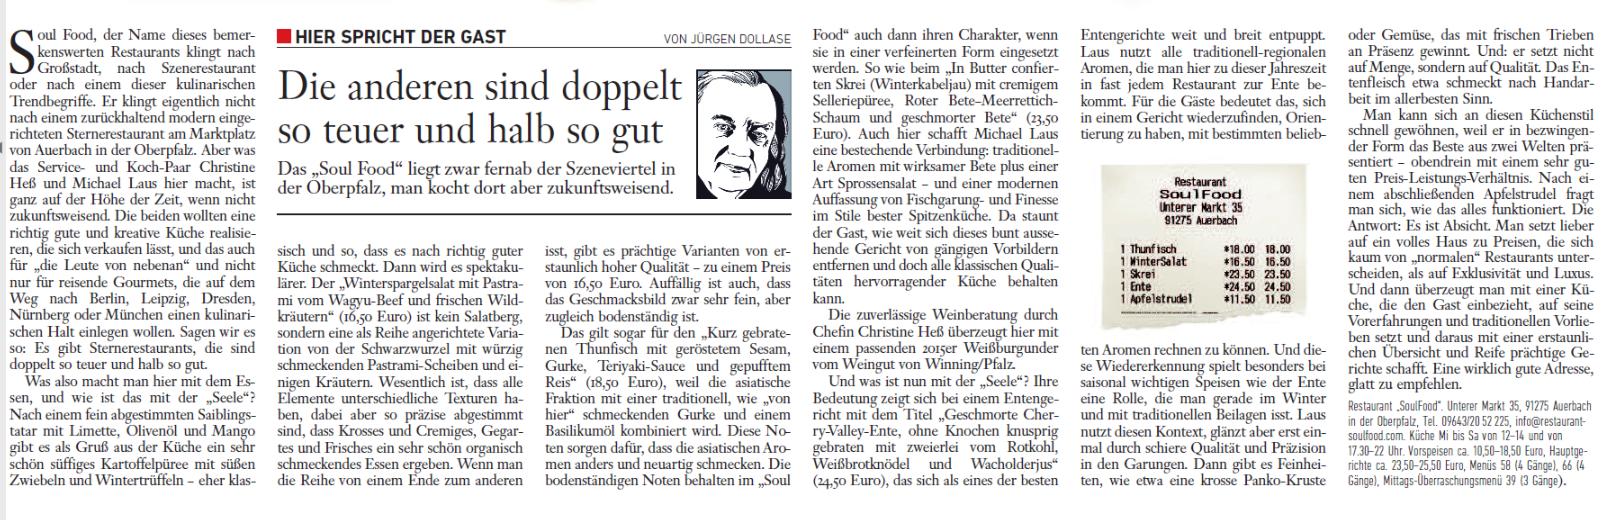 Bericht Jürgen Dollase Februar 2018